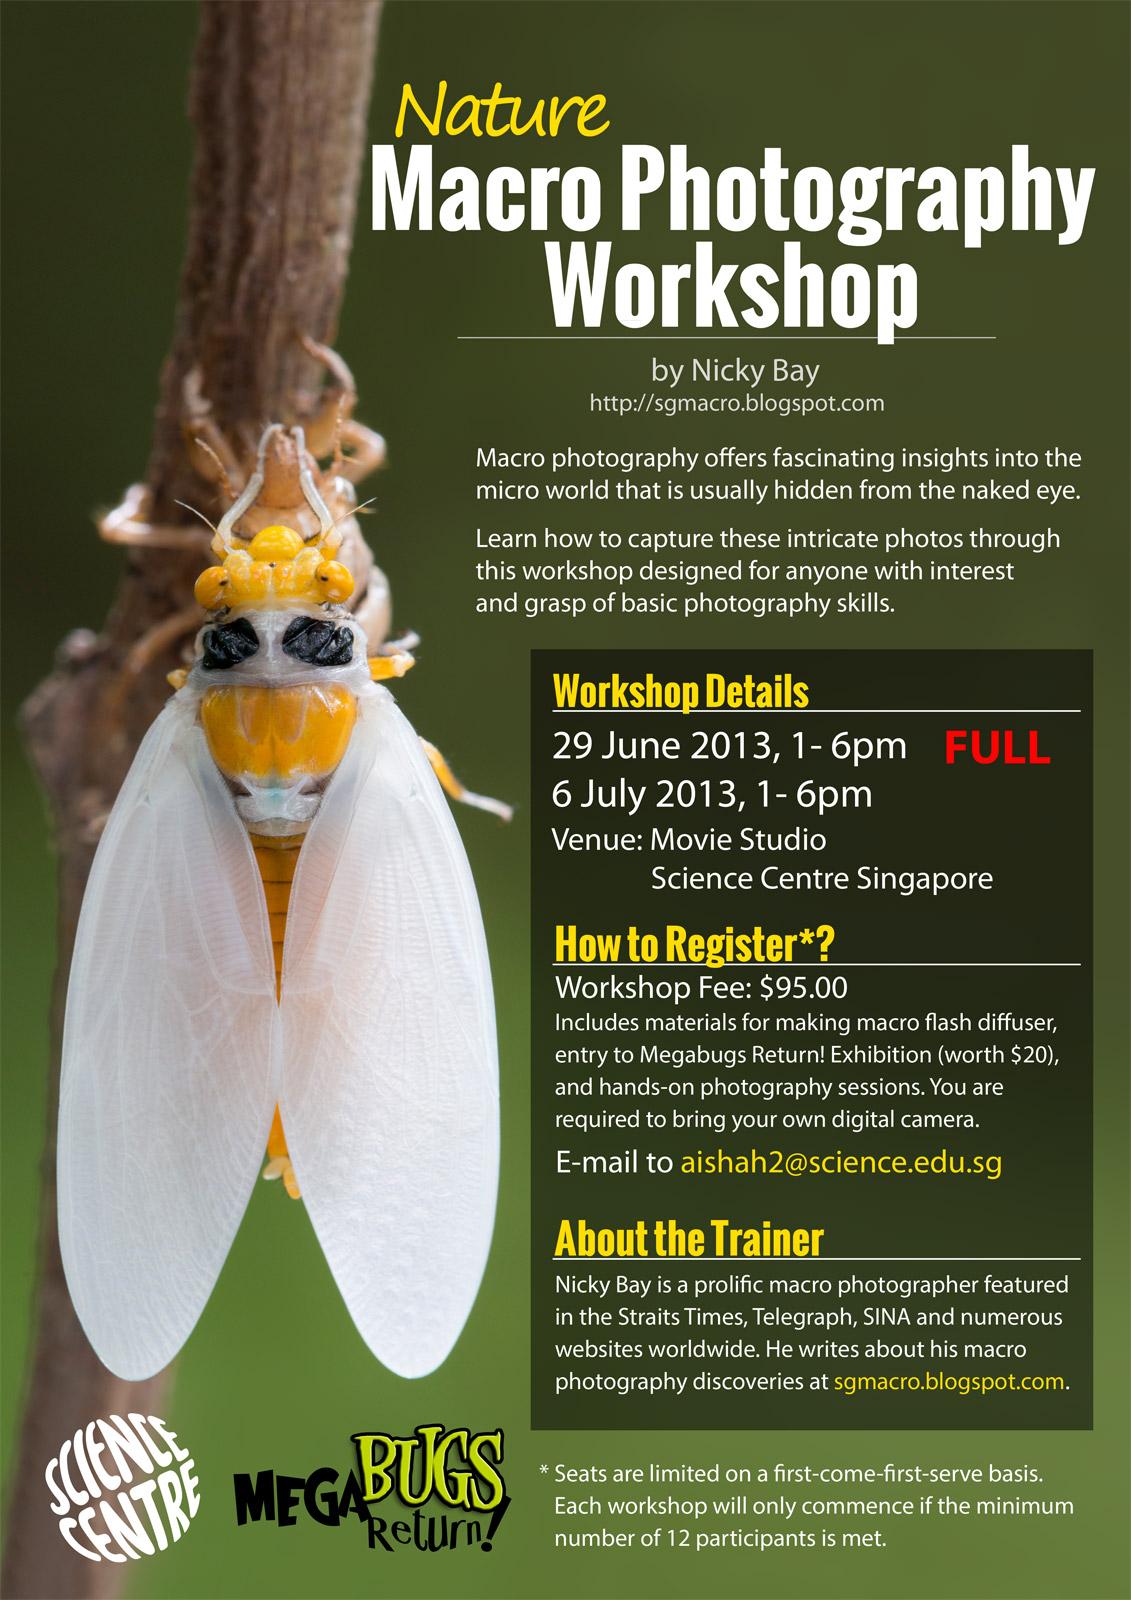 Nature Macro Photography Workshop Science Centre Singapore